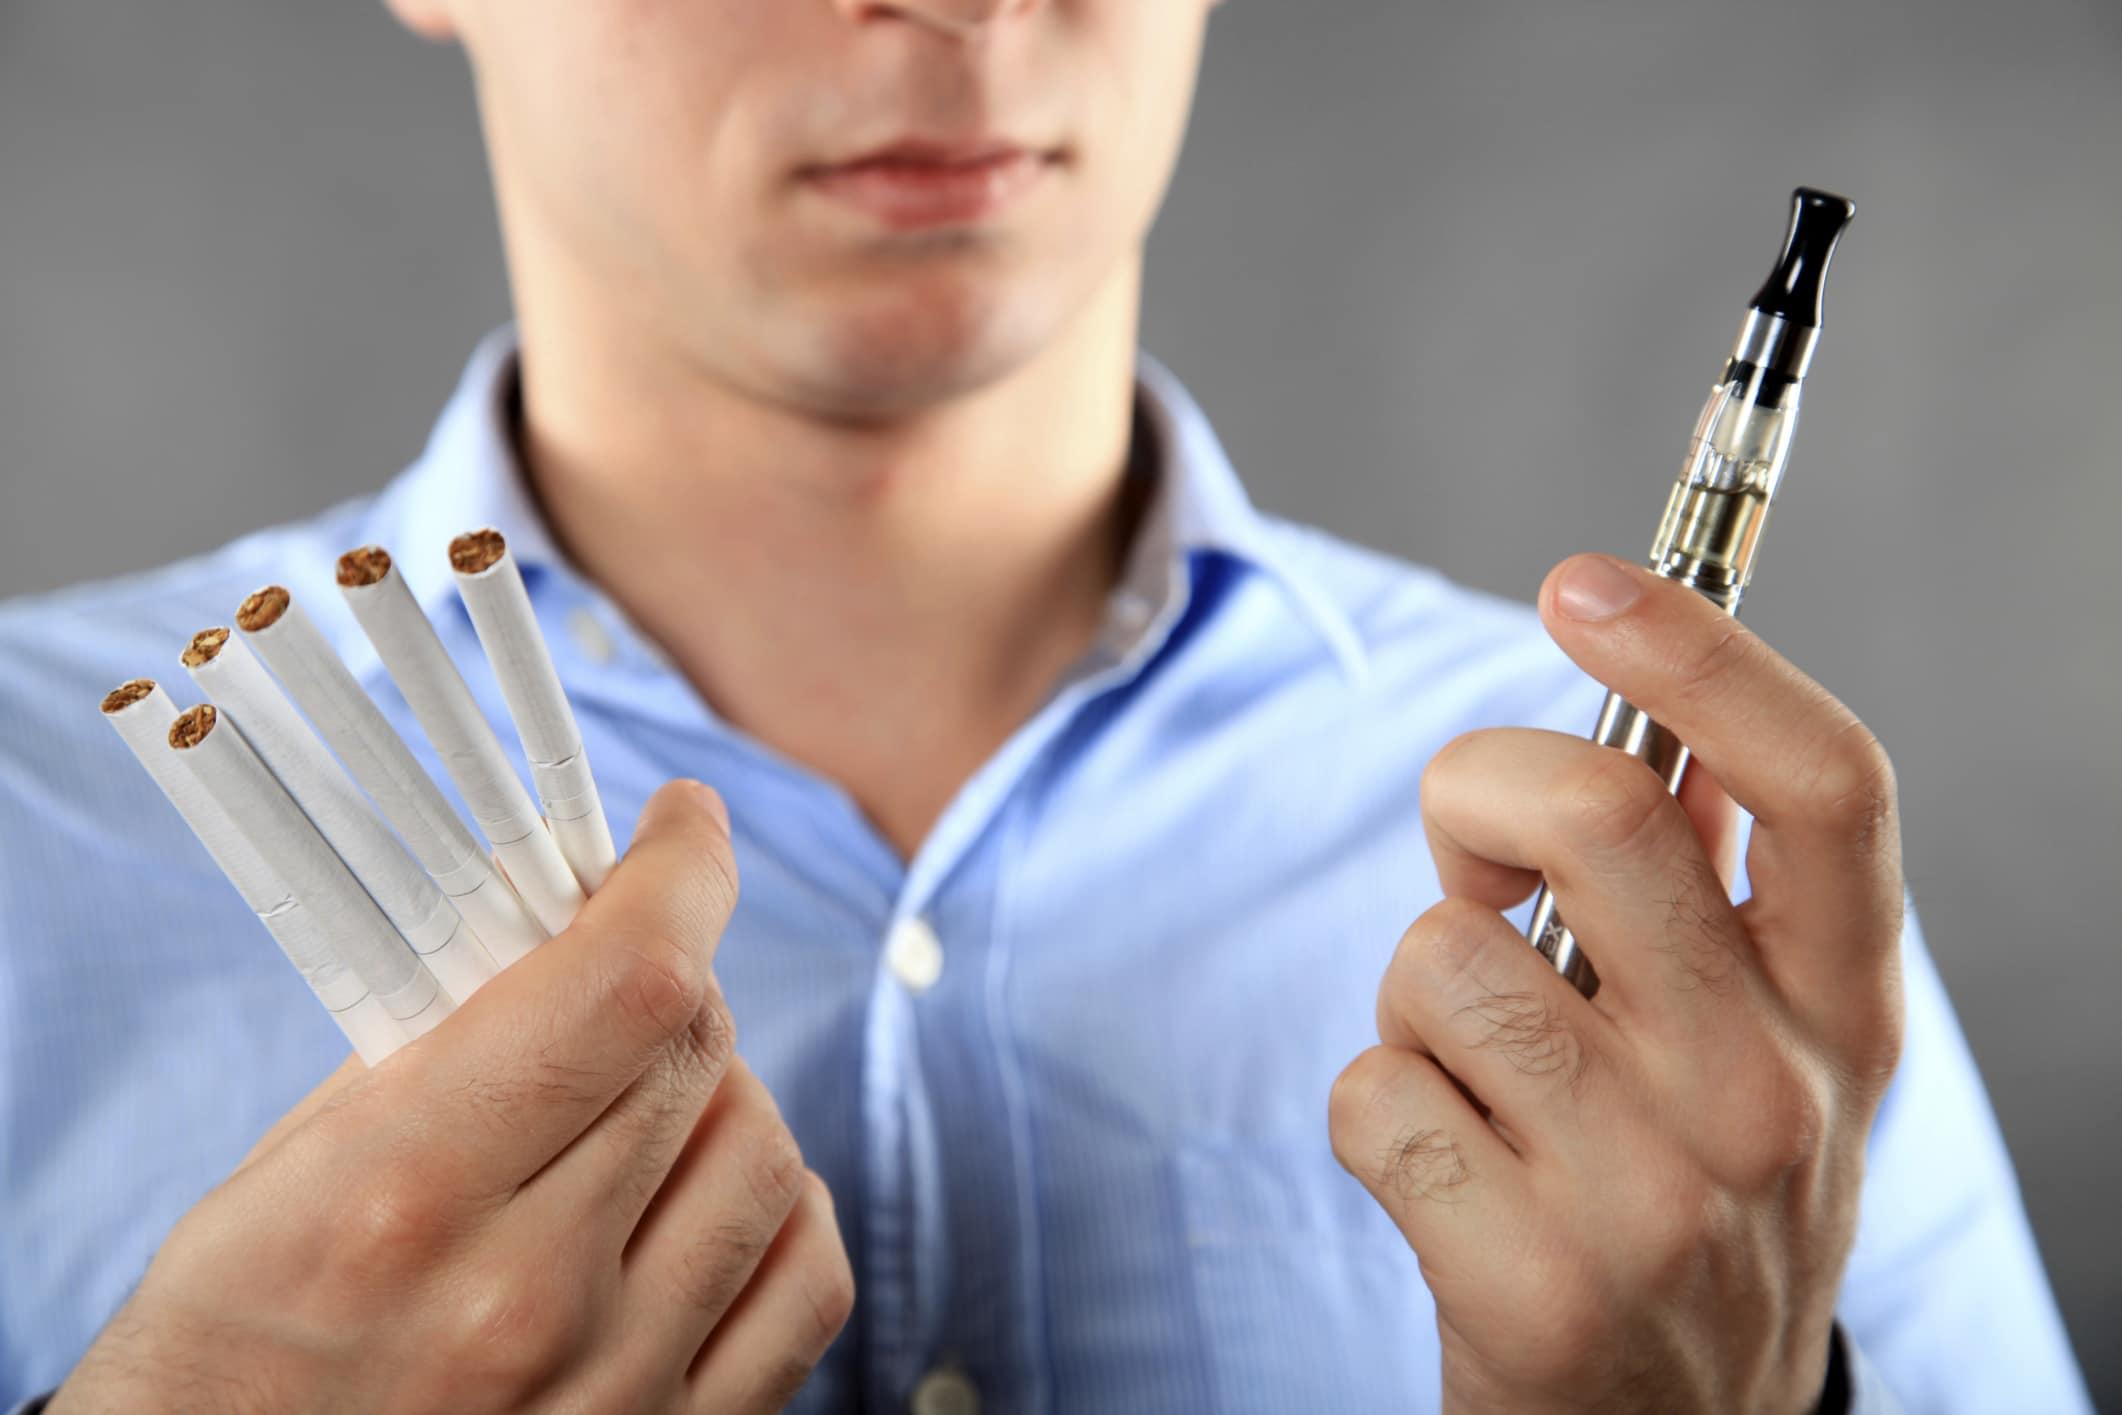 A CBD e-liquid against the addiction to tobacco